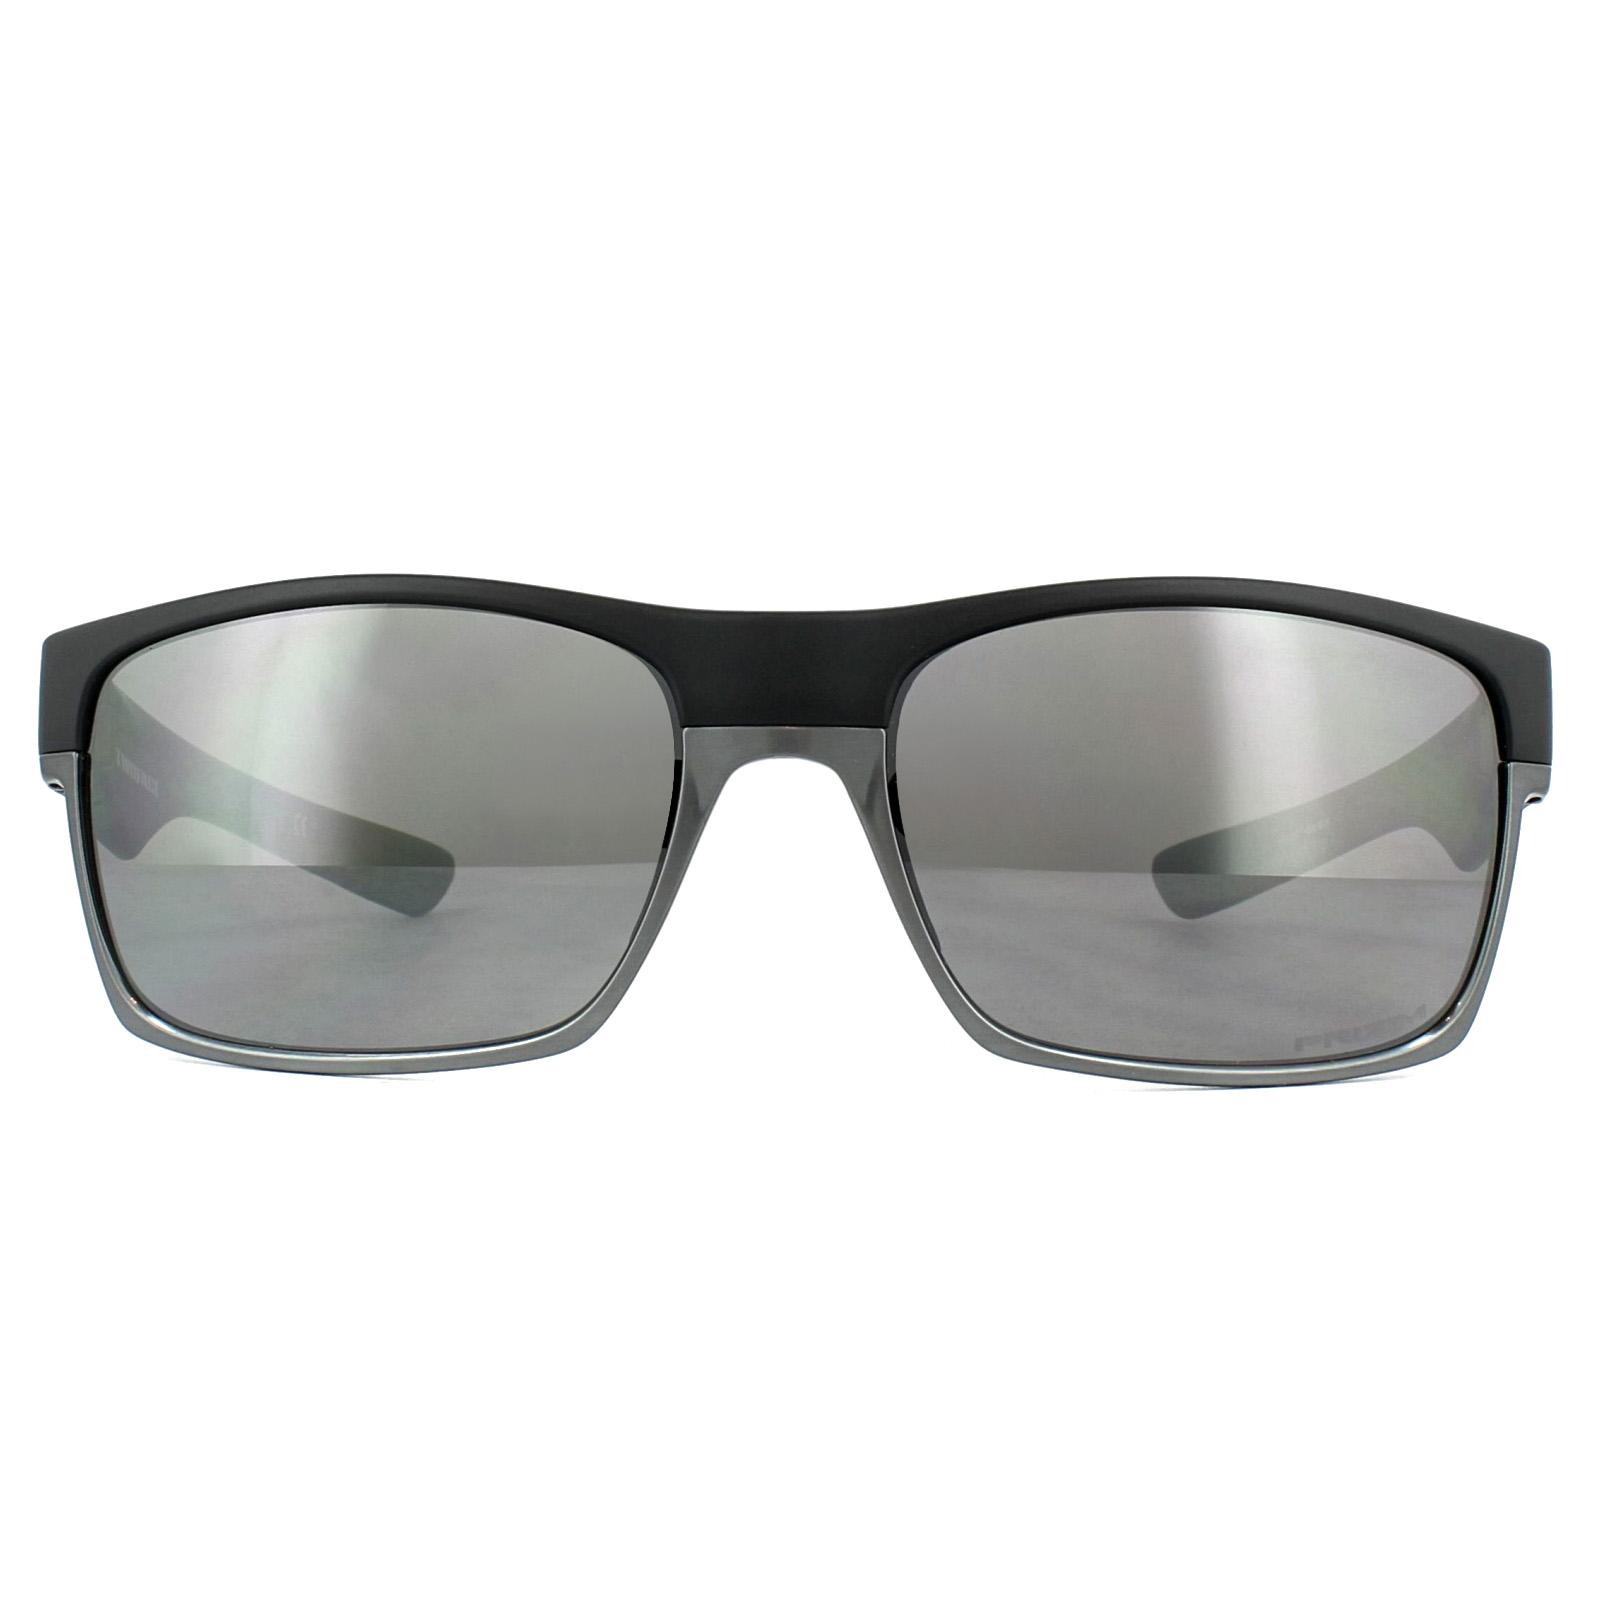 e777e6c4bd1 Sentinel Oakley Sunglasses TwoFace OO9189-38 Matt Black Prizm Daily  Polarized